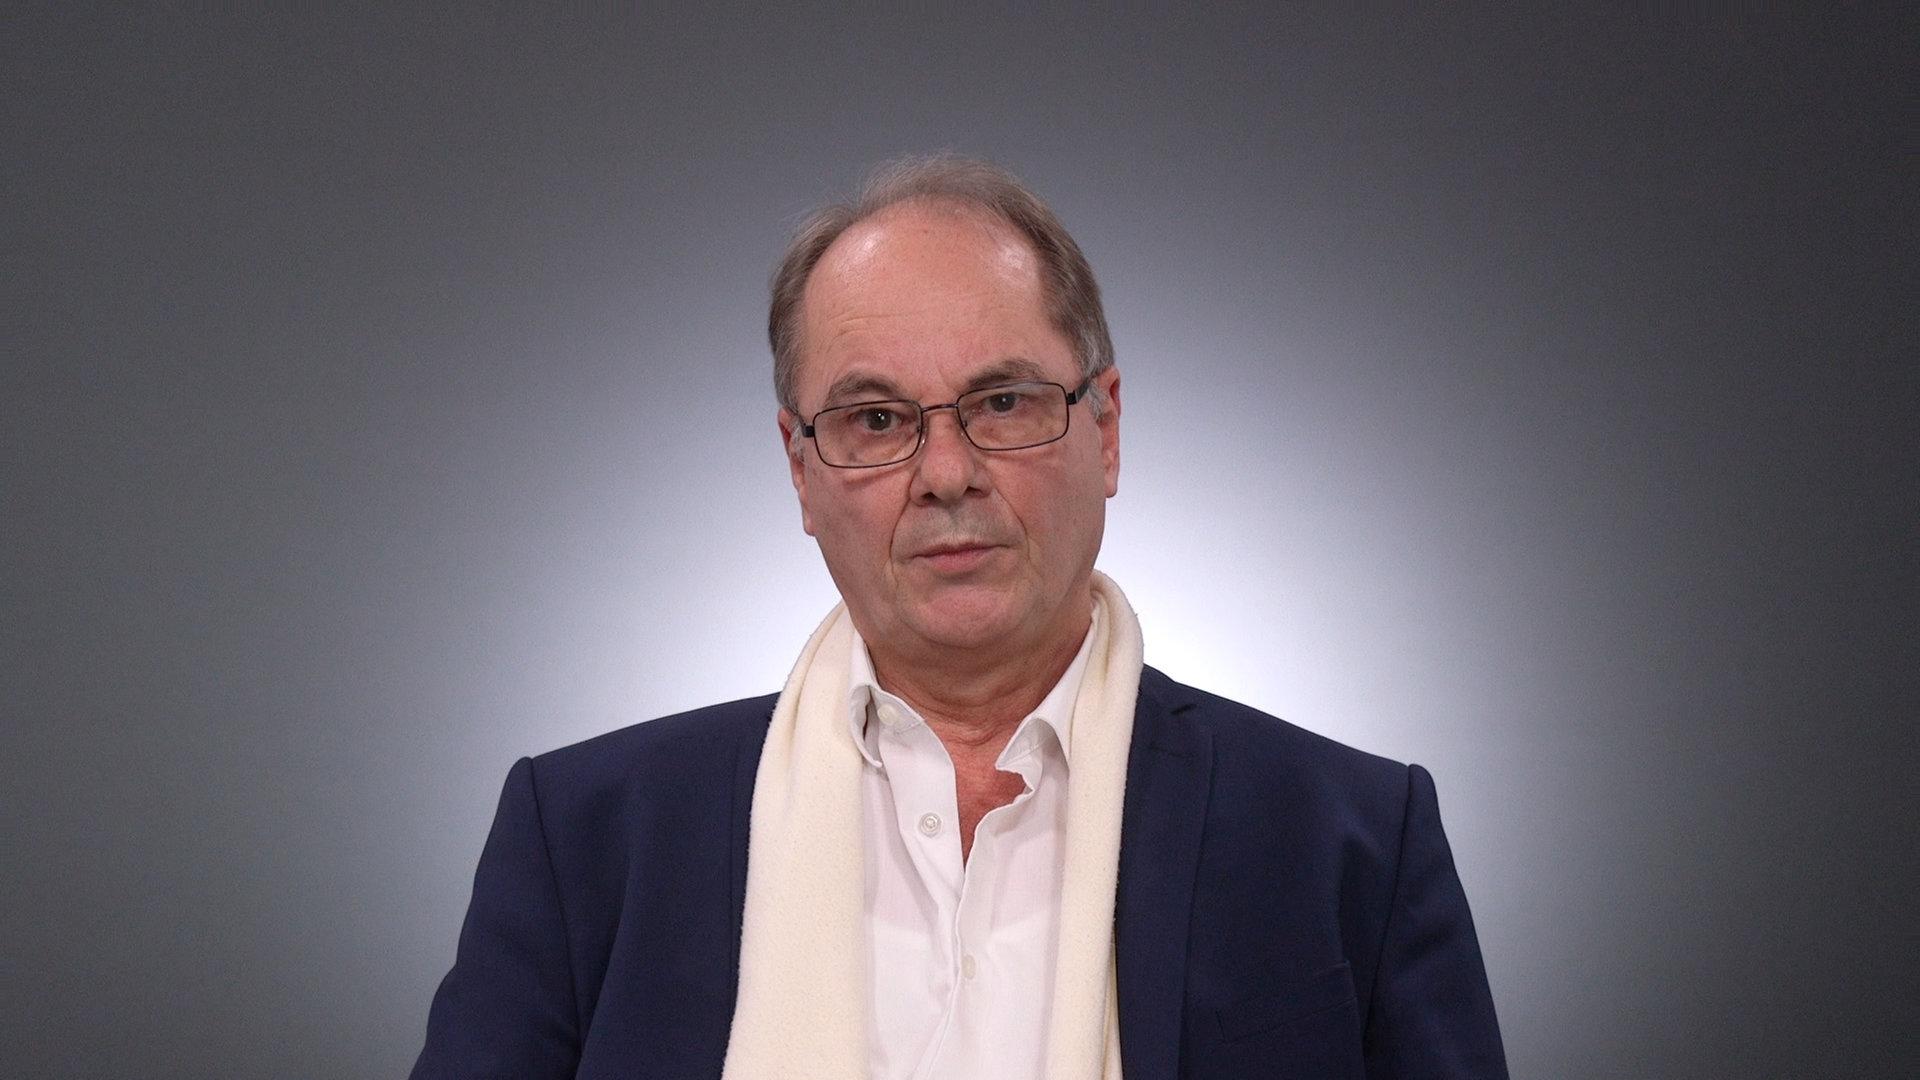 Ralf Niemeyer, CDU